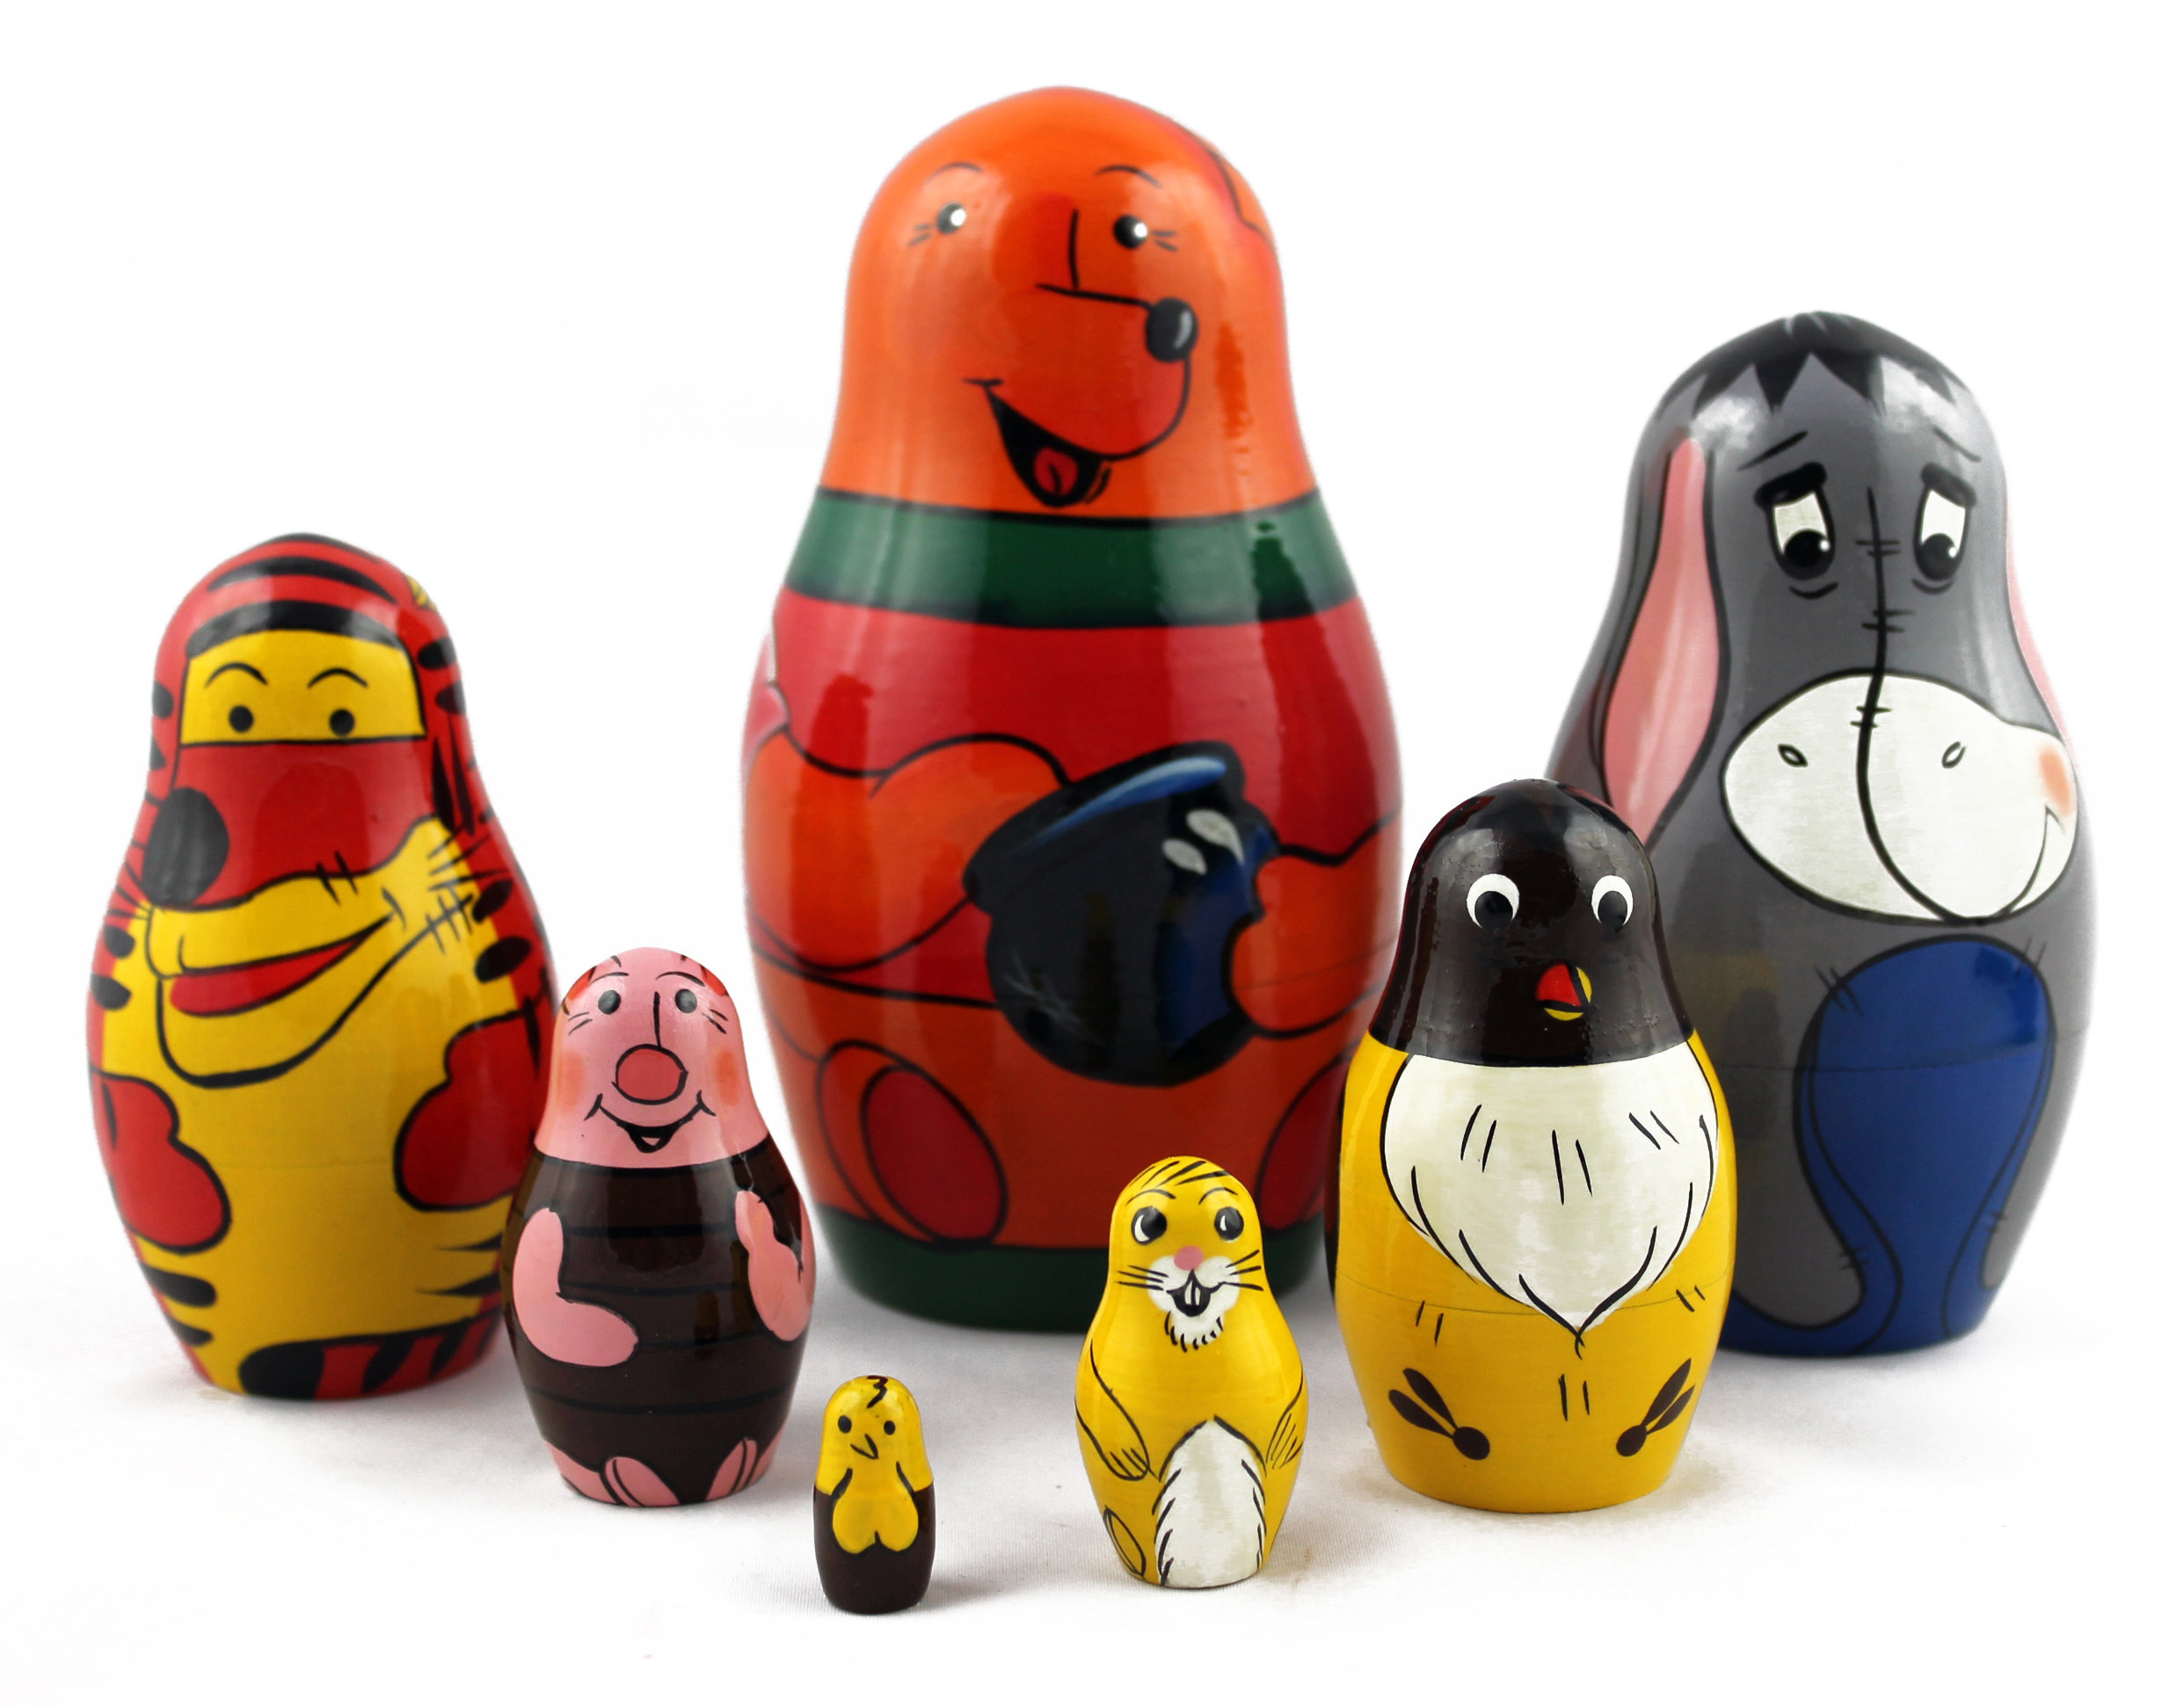 7pc Penguin Matryoshka Russian Handmade Stacking Nesting Wooden Dolls in Dolls